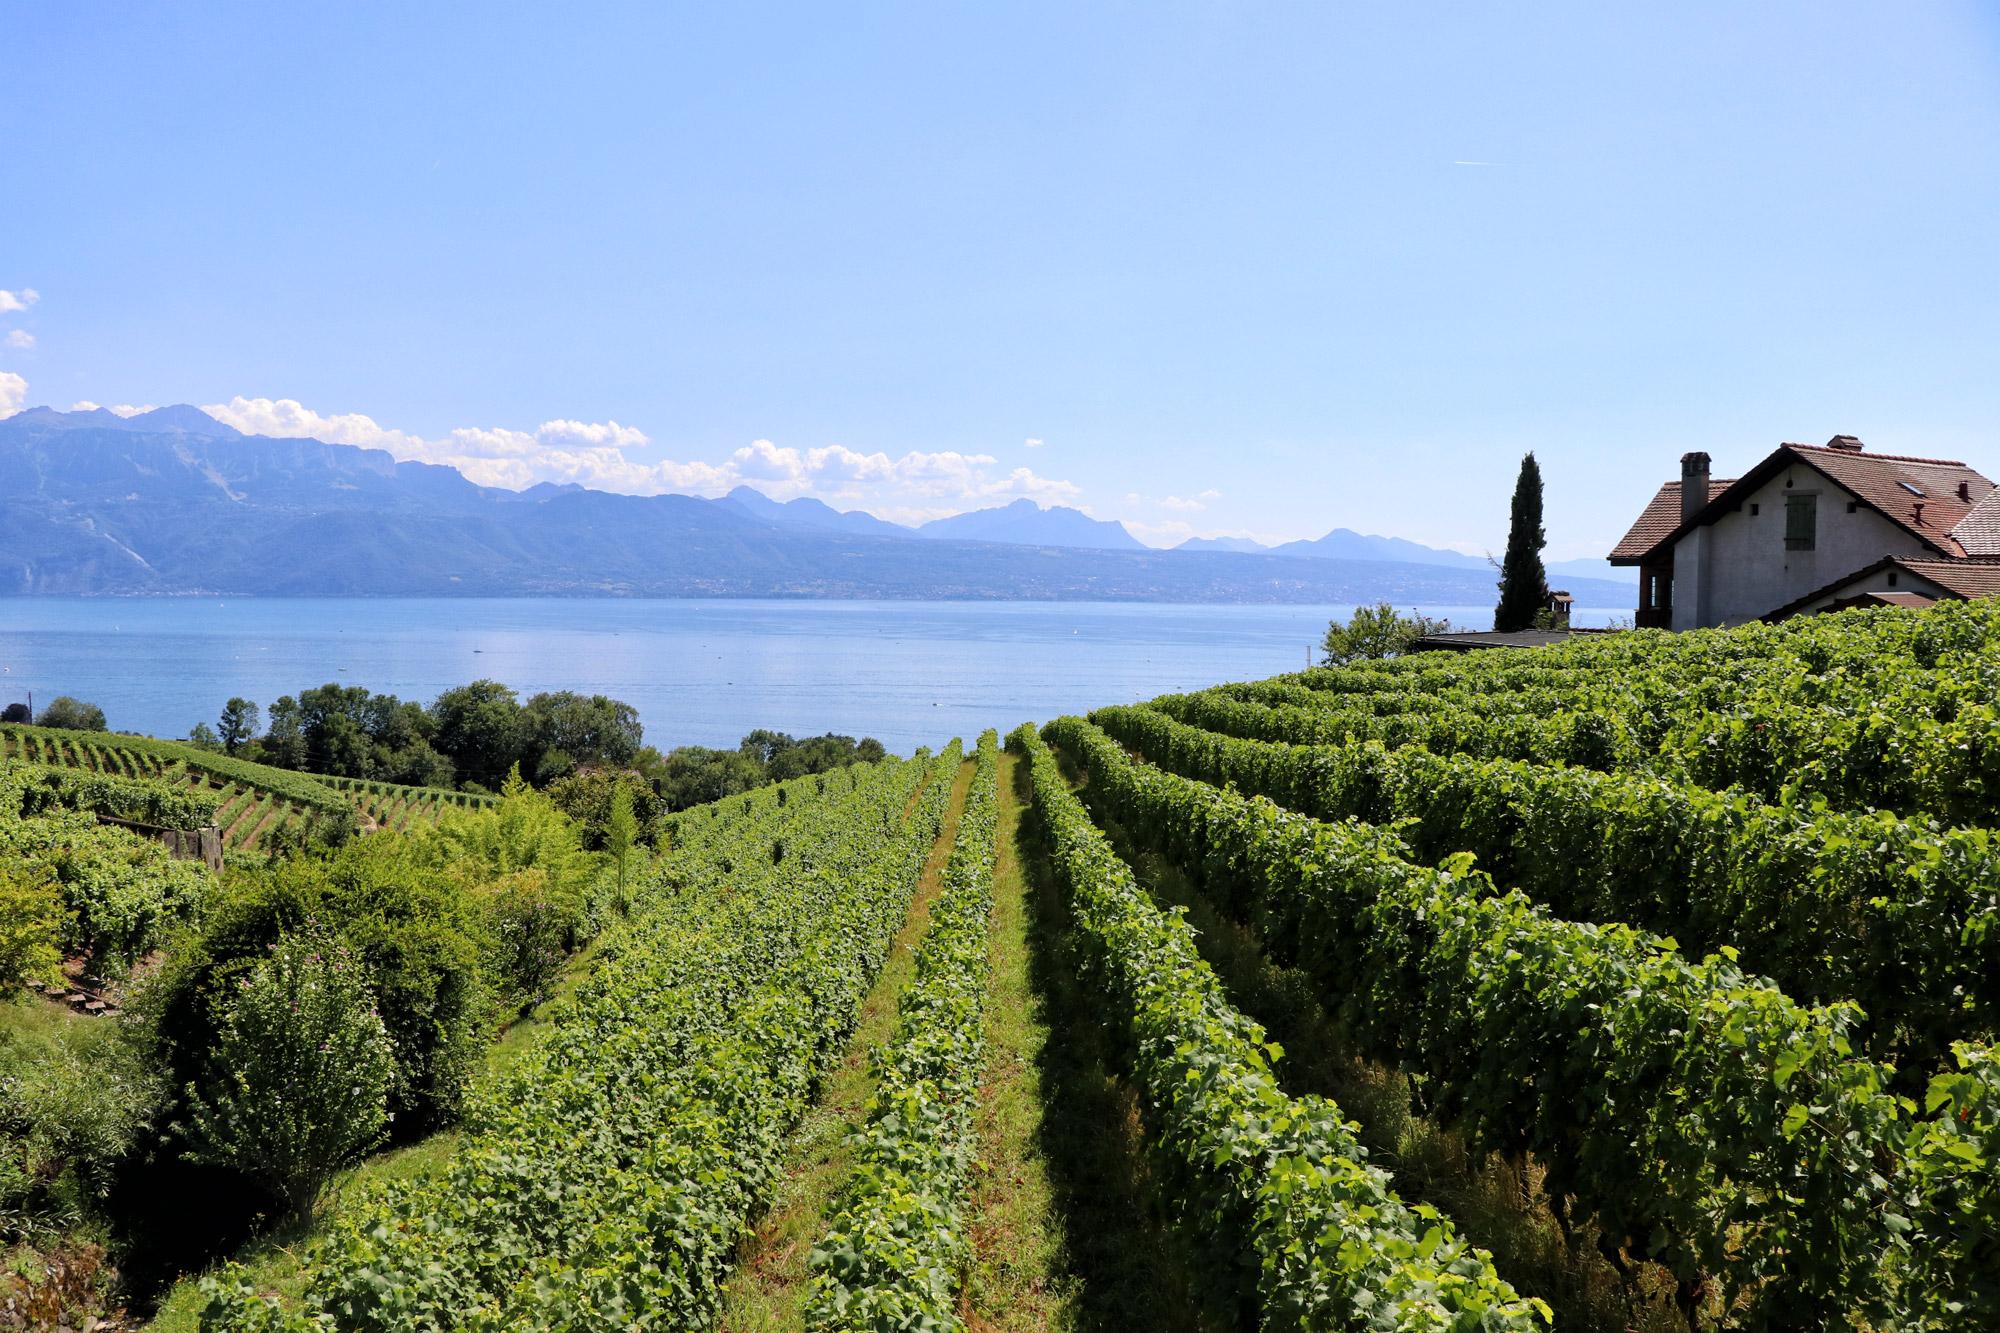 Zwitserland - Wijnbergterrassen van Lavaux